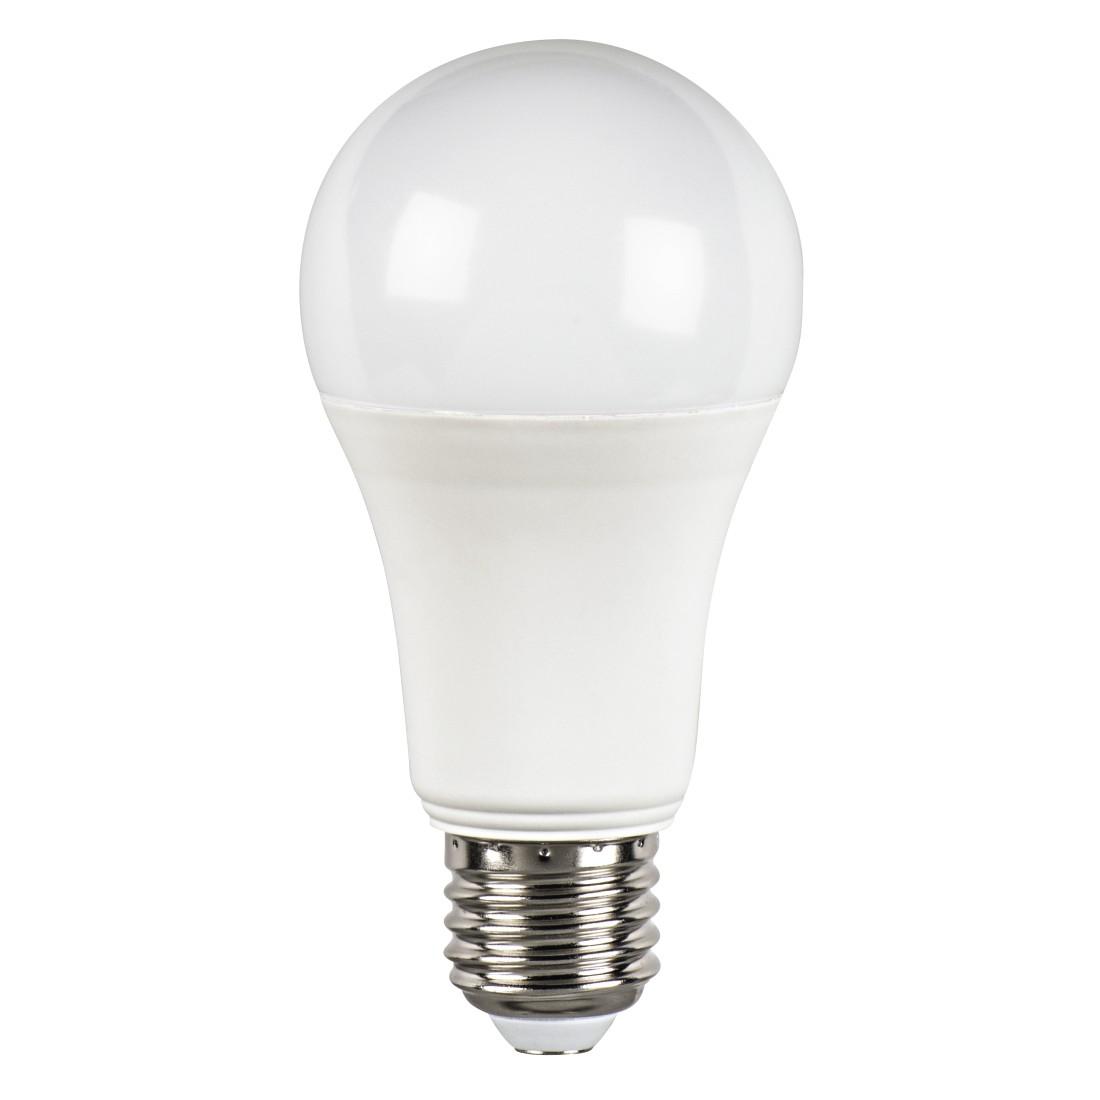 lampe lumiere naturelle trendy scon w lampe de piste spotlight led guide lampe fond mur photo. Black Bedroom Furniture Sets. Home Design Ideas